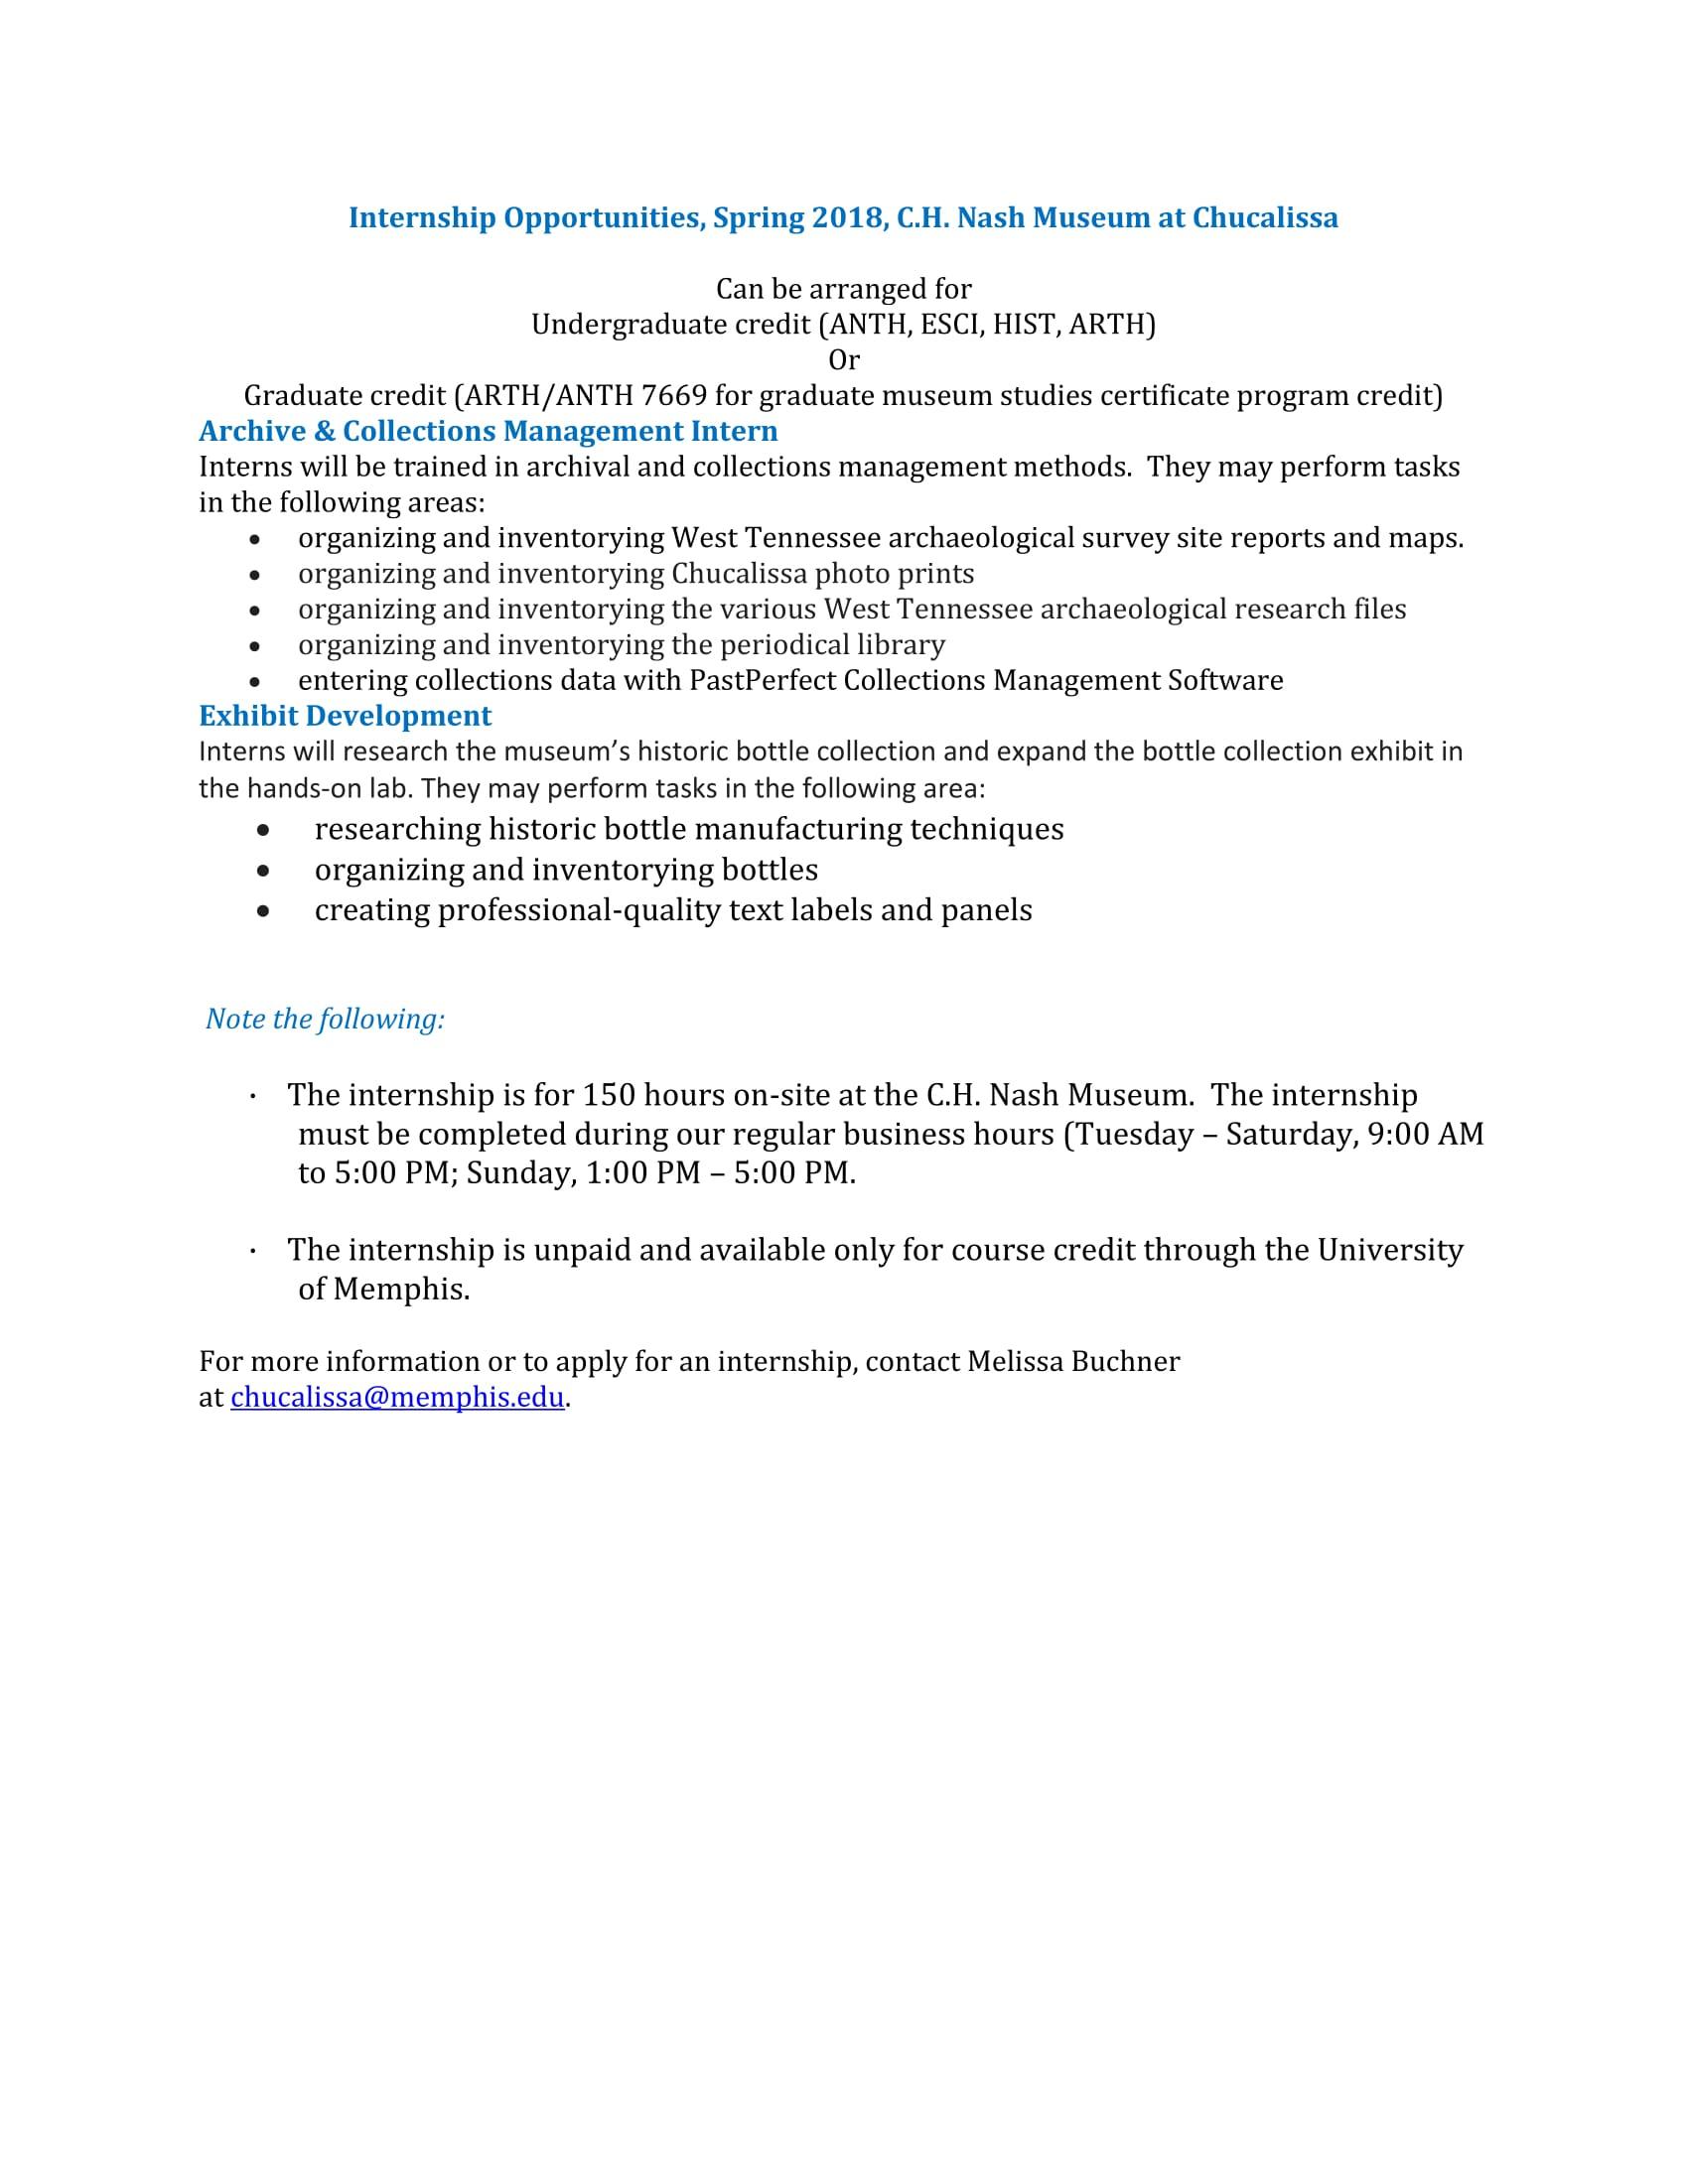 Spring 2018 Chucalissa Interships